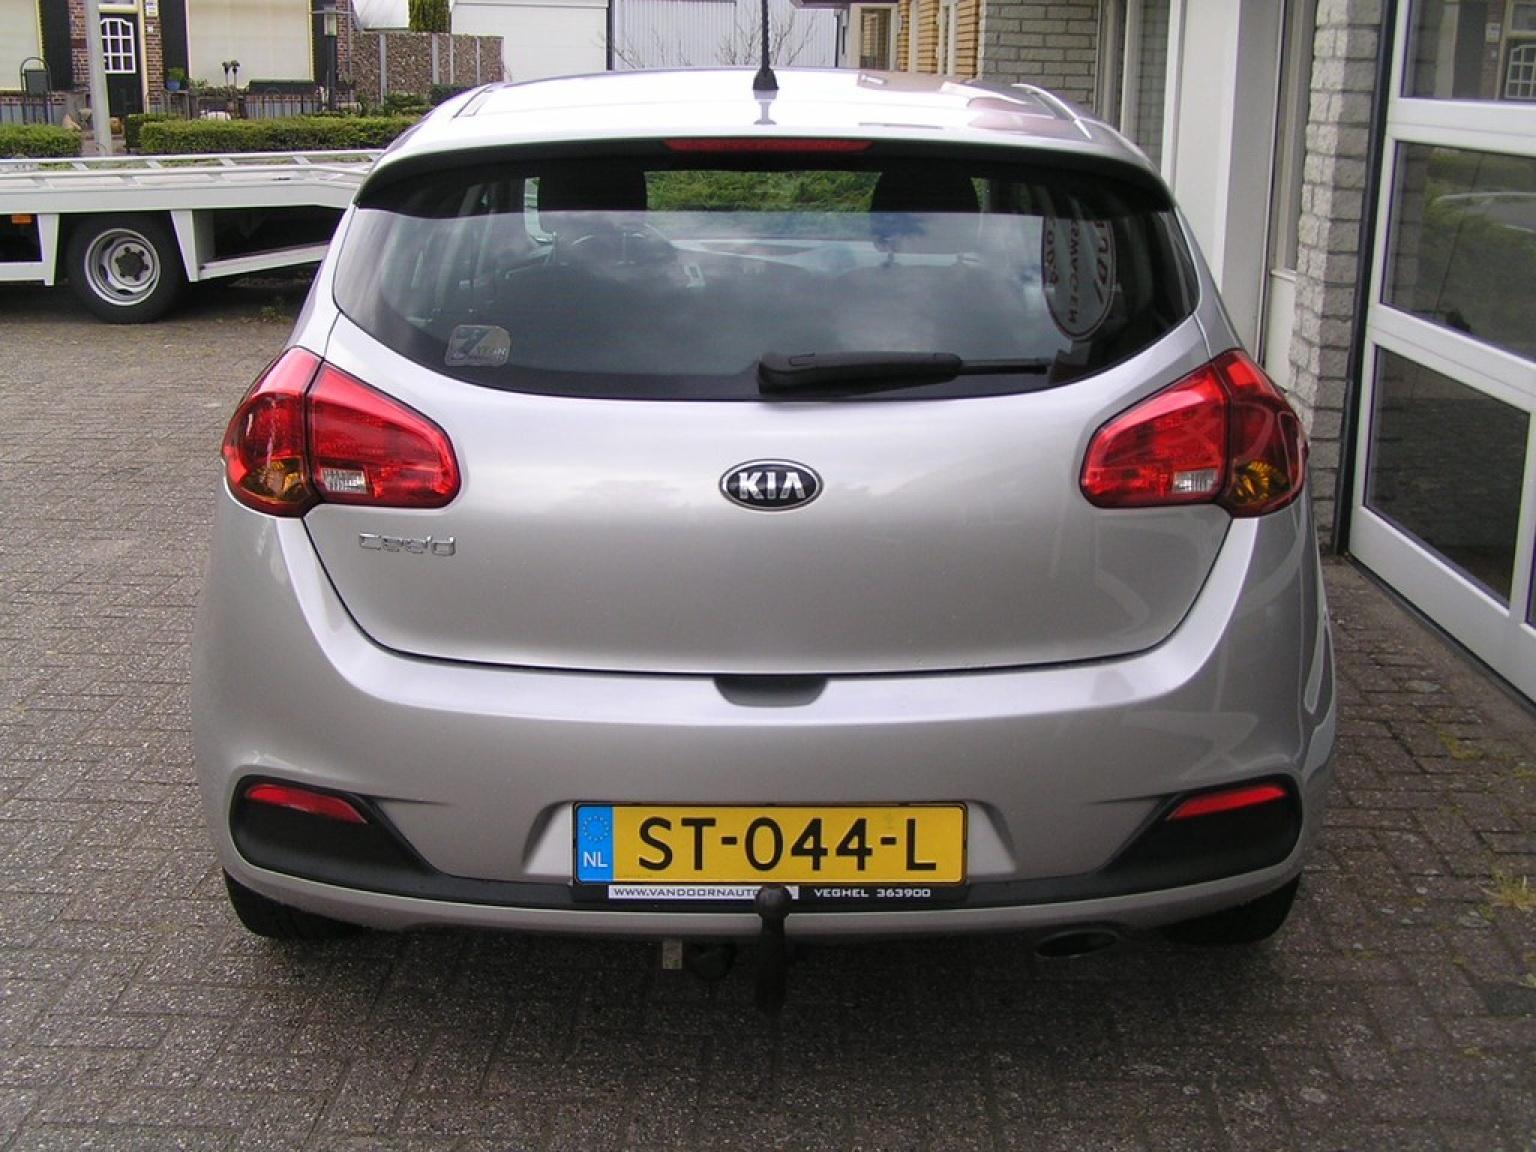 Kia-cee'd-2